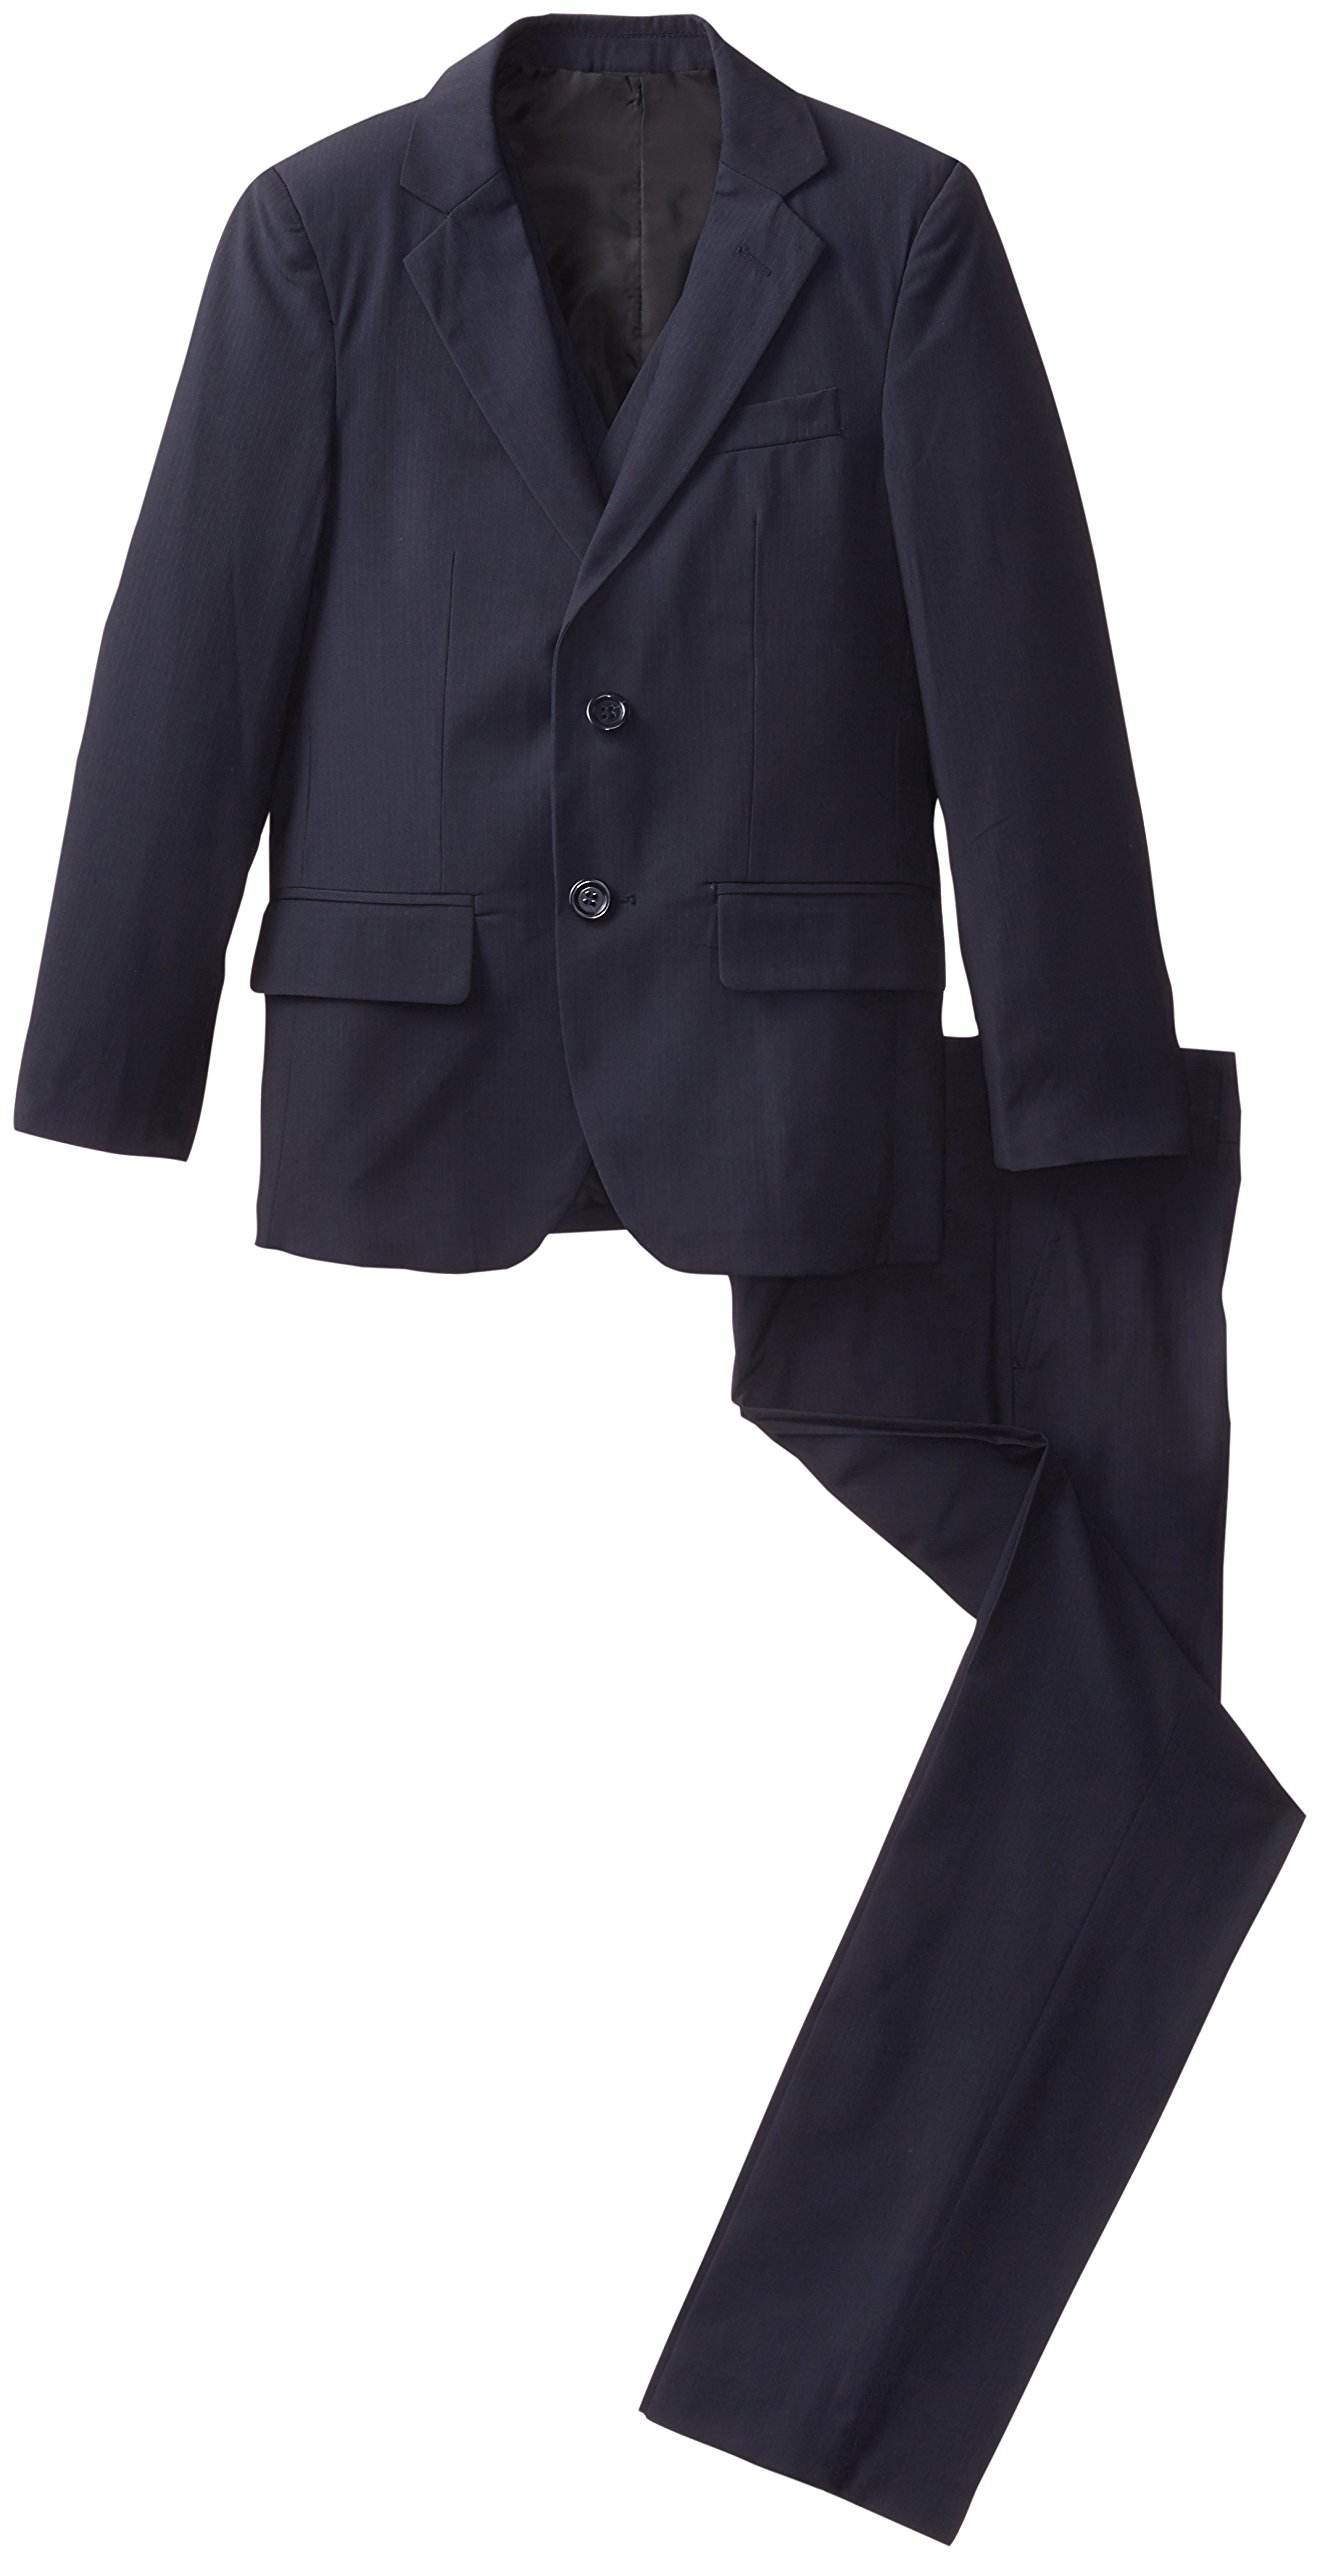 American Exchange Big Boys' Self Stripe 3-Piece Suit, Navy, 18